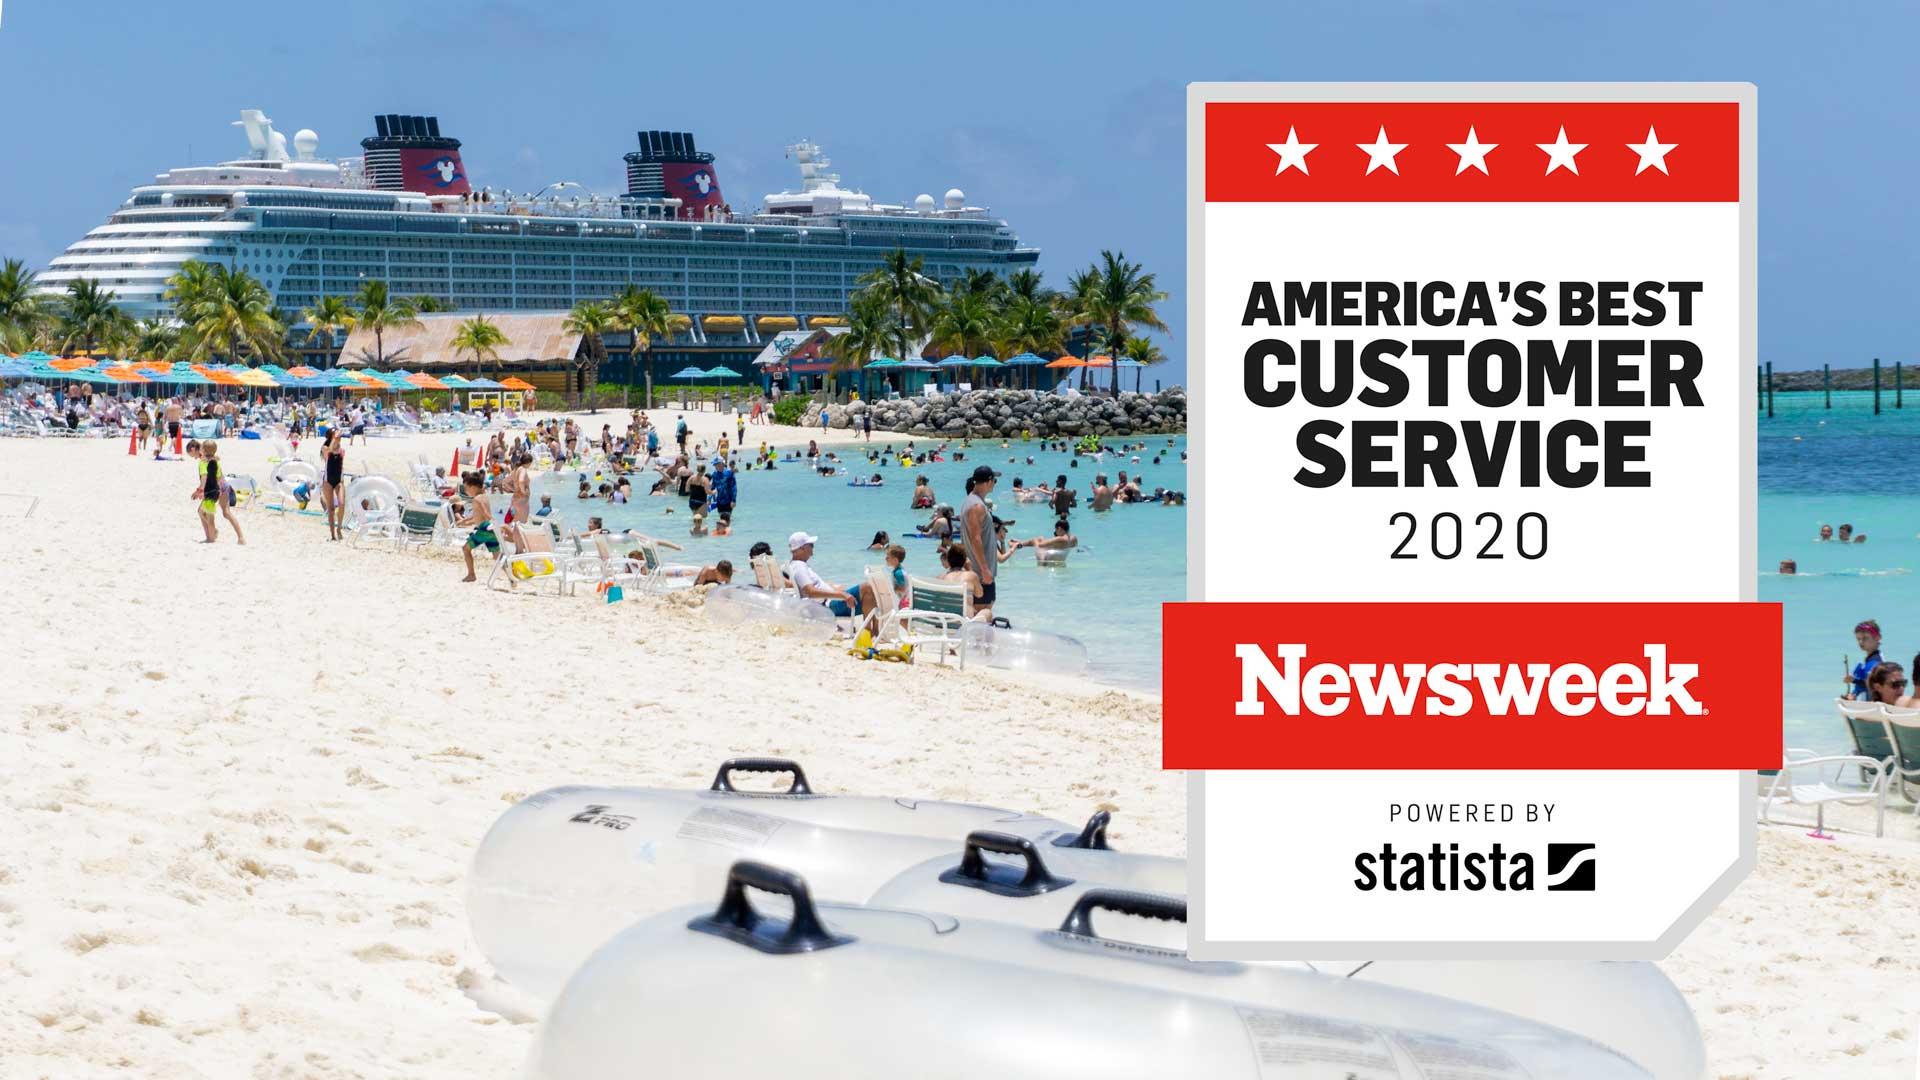 Newsweek Customer Service Awards 2020